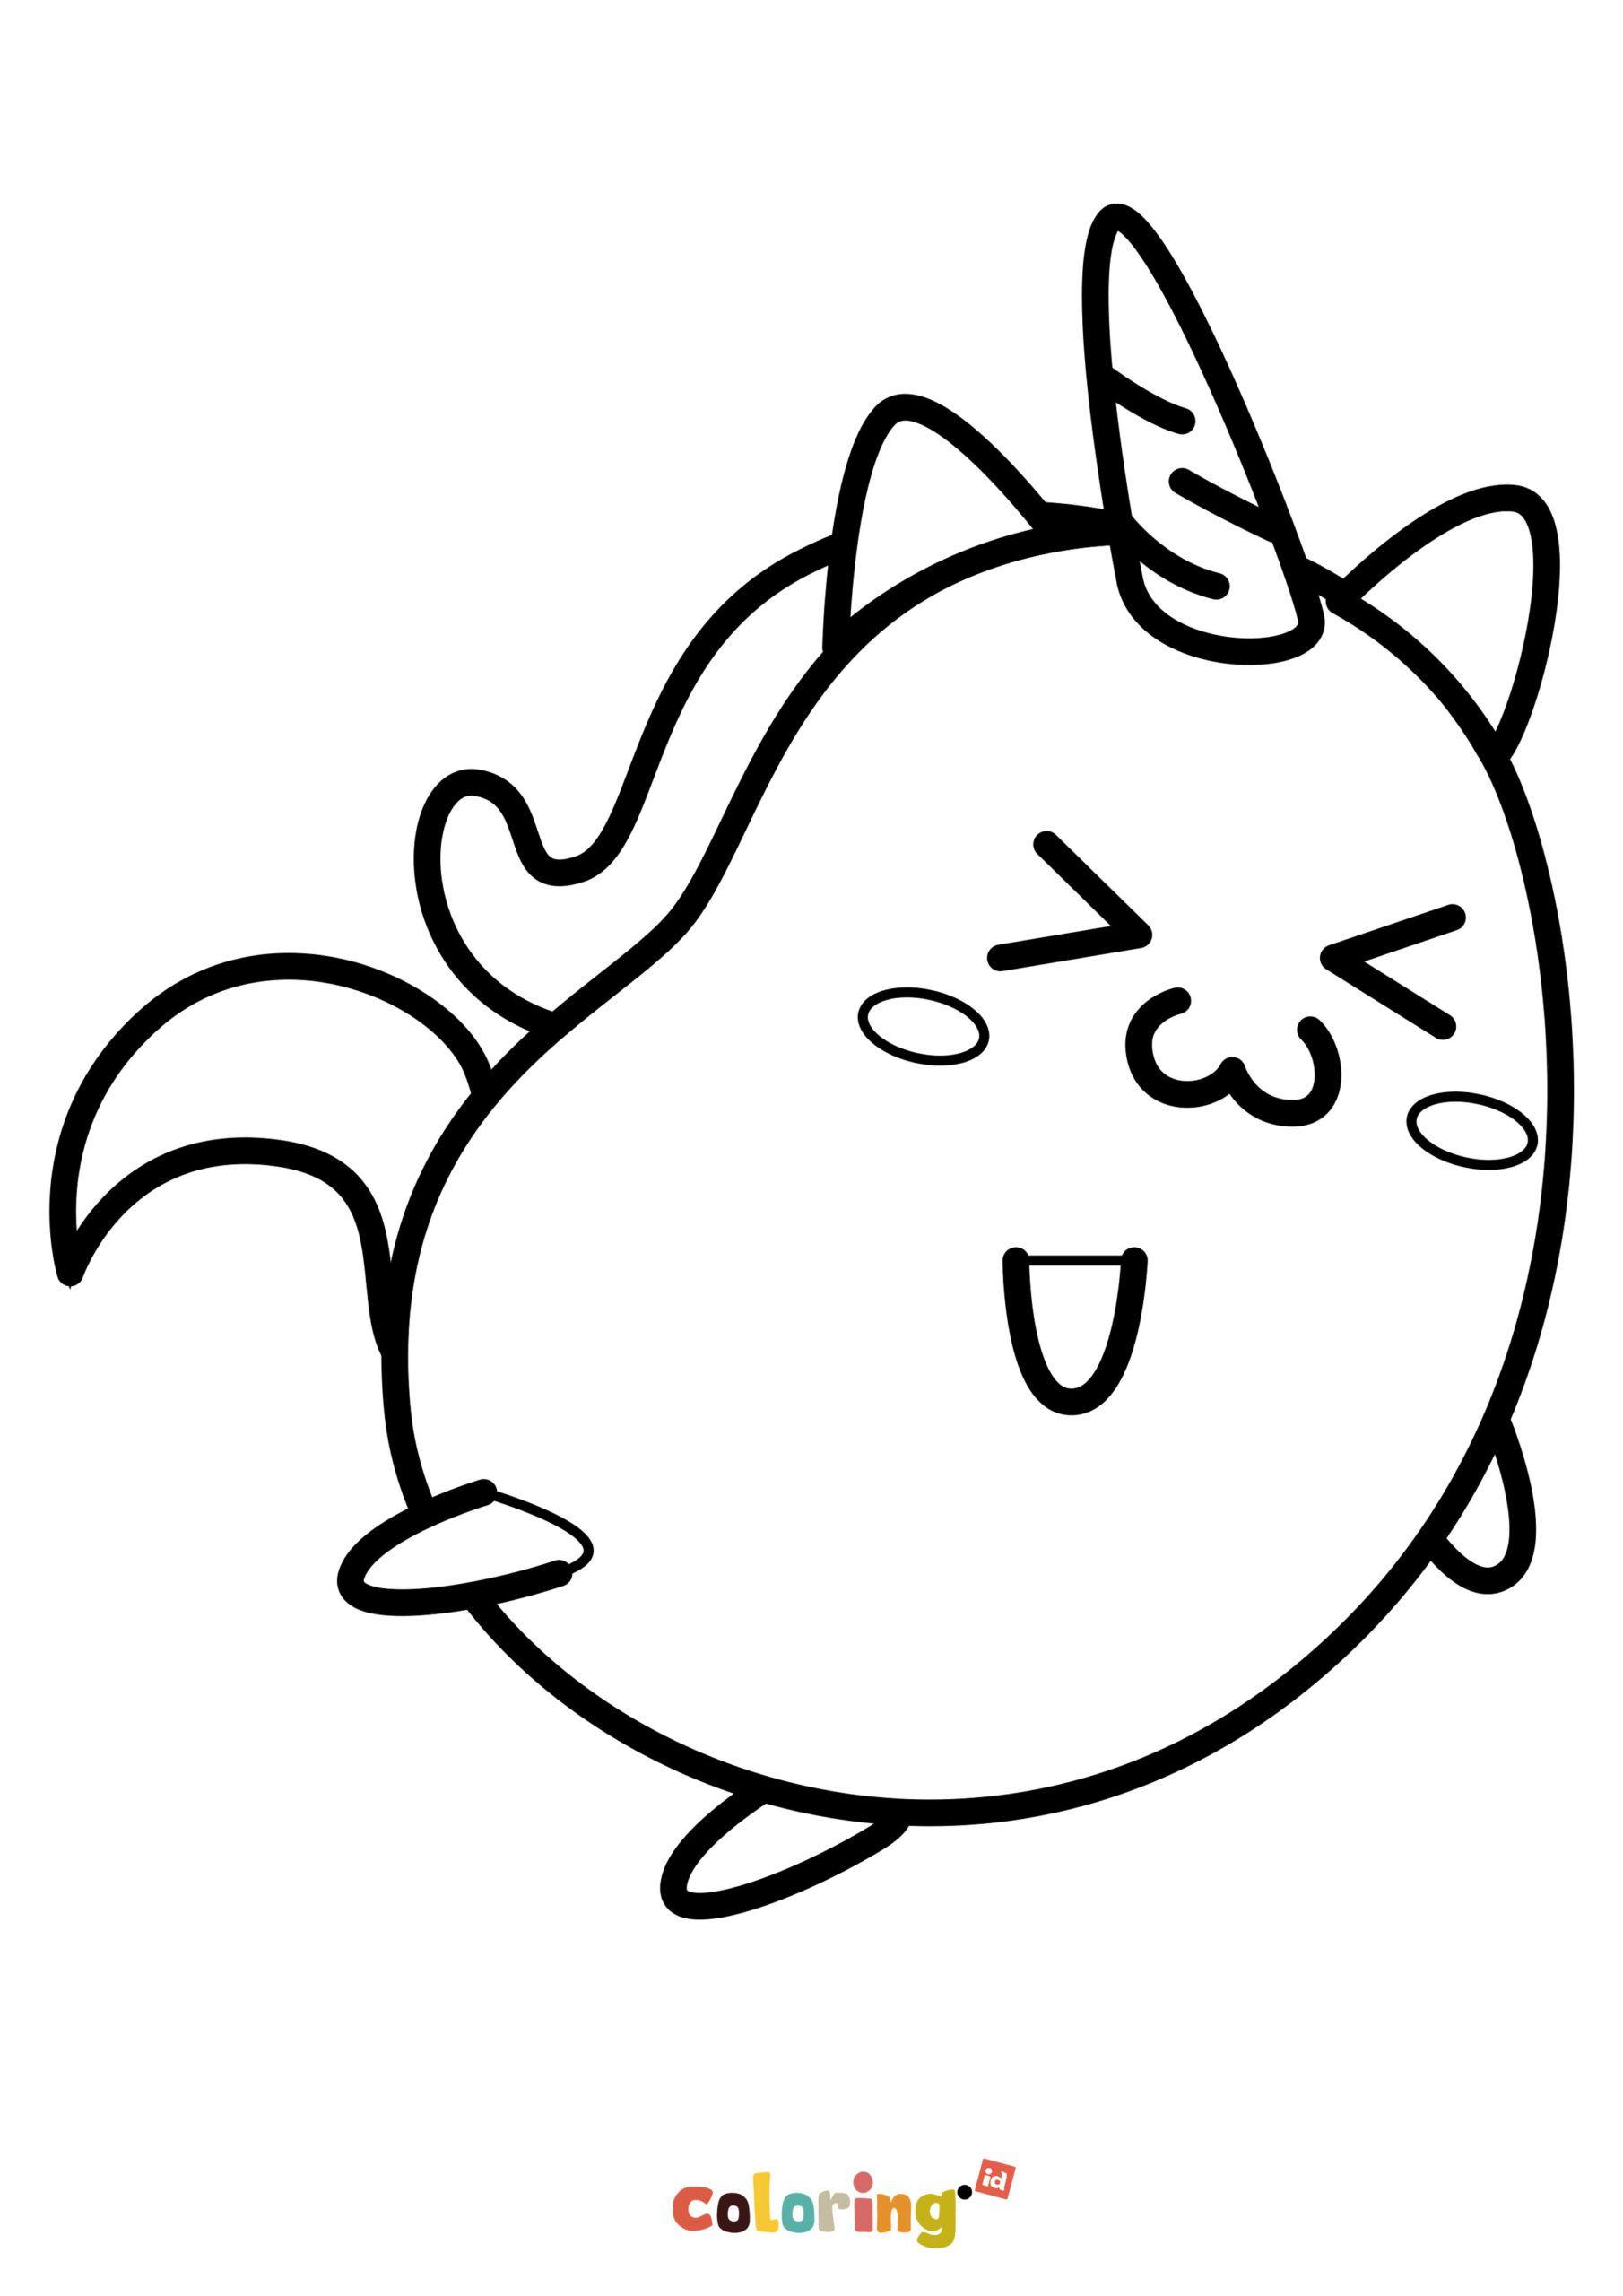 Unicorn Kawaii Coloring Pages : unicorn, kawaii, coloring, pages, Unicorn, Kawaii, Coloring, Kids.!, Print, Pages, Preschool,, Kindergarte…, Pages,, Books